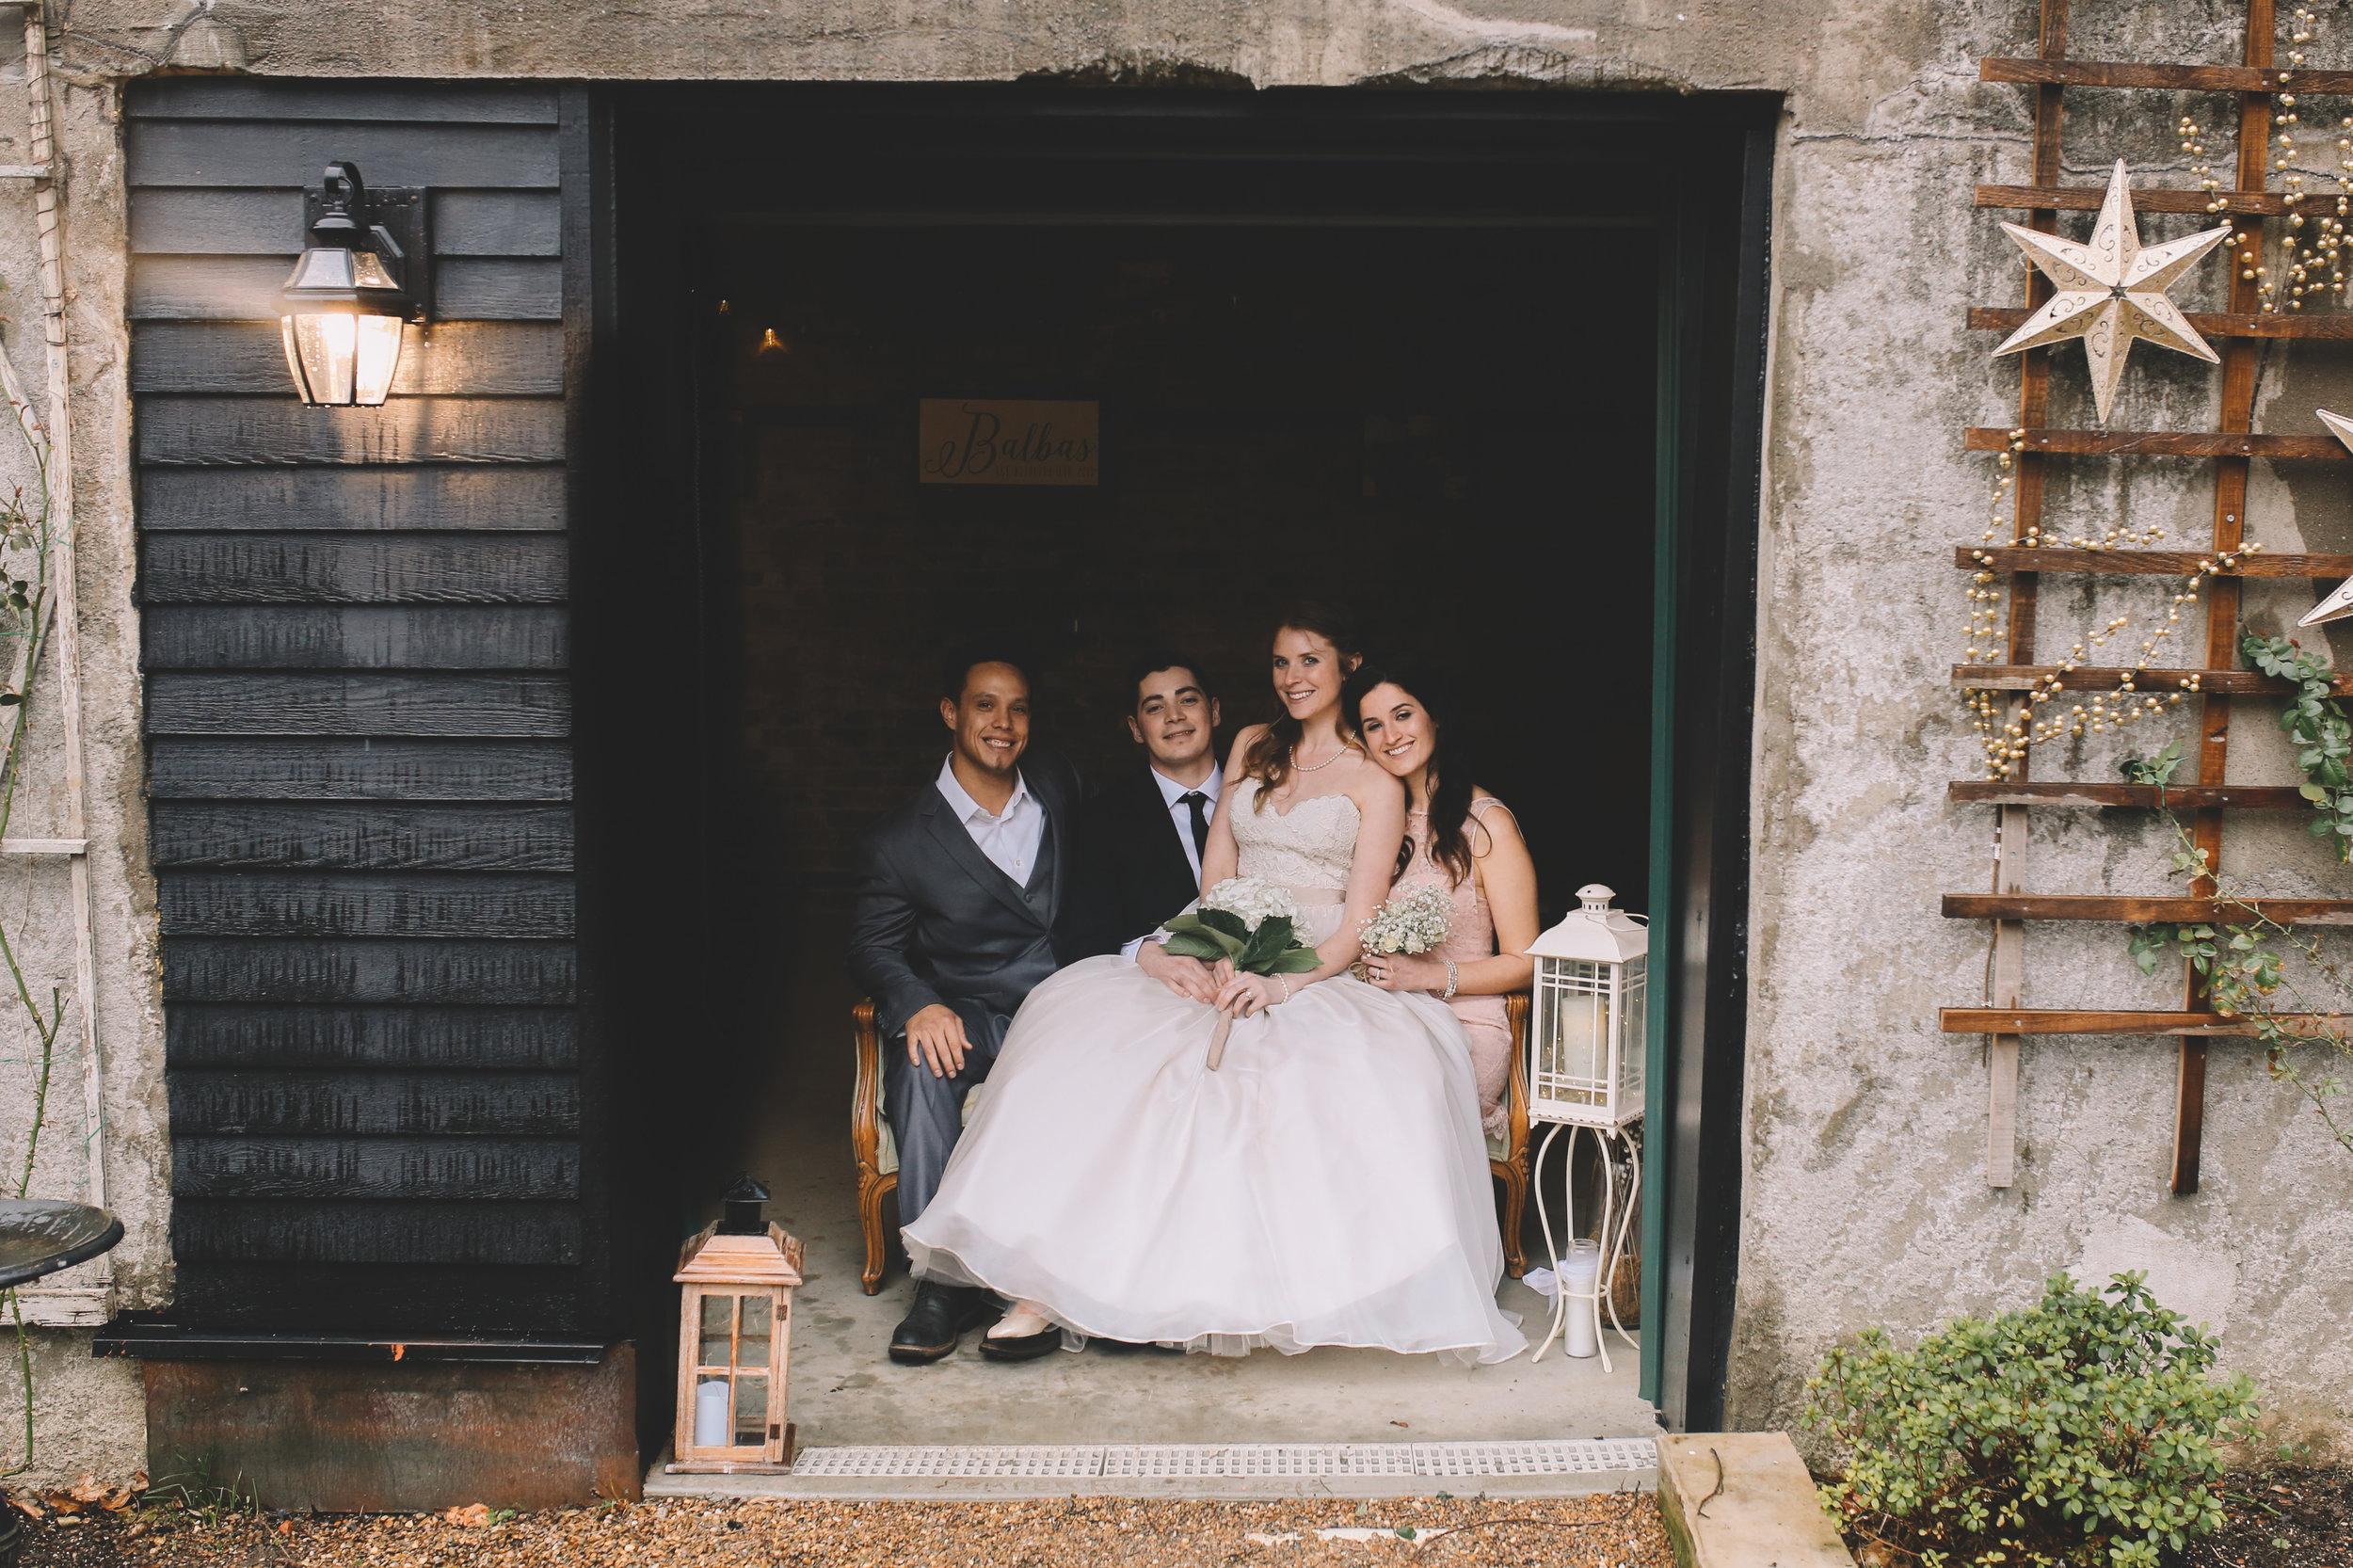 Jake + Brittney Balbas Airbnb Carriage House Wedding Evansville IN (209 of 426).jpg